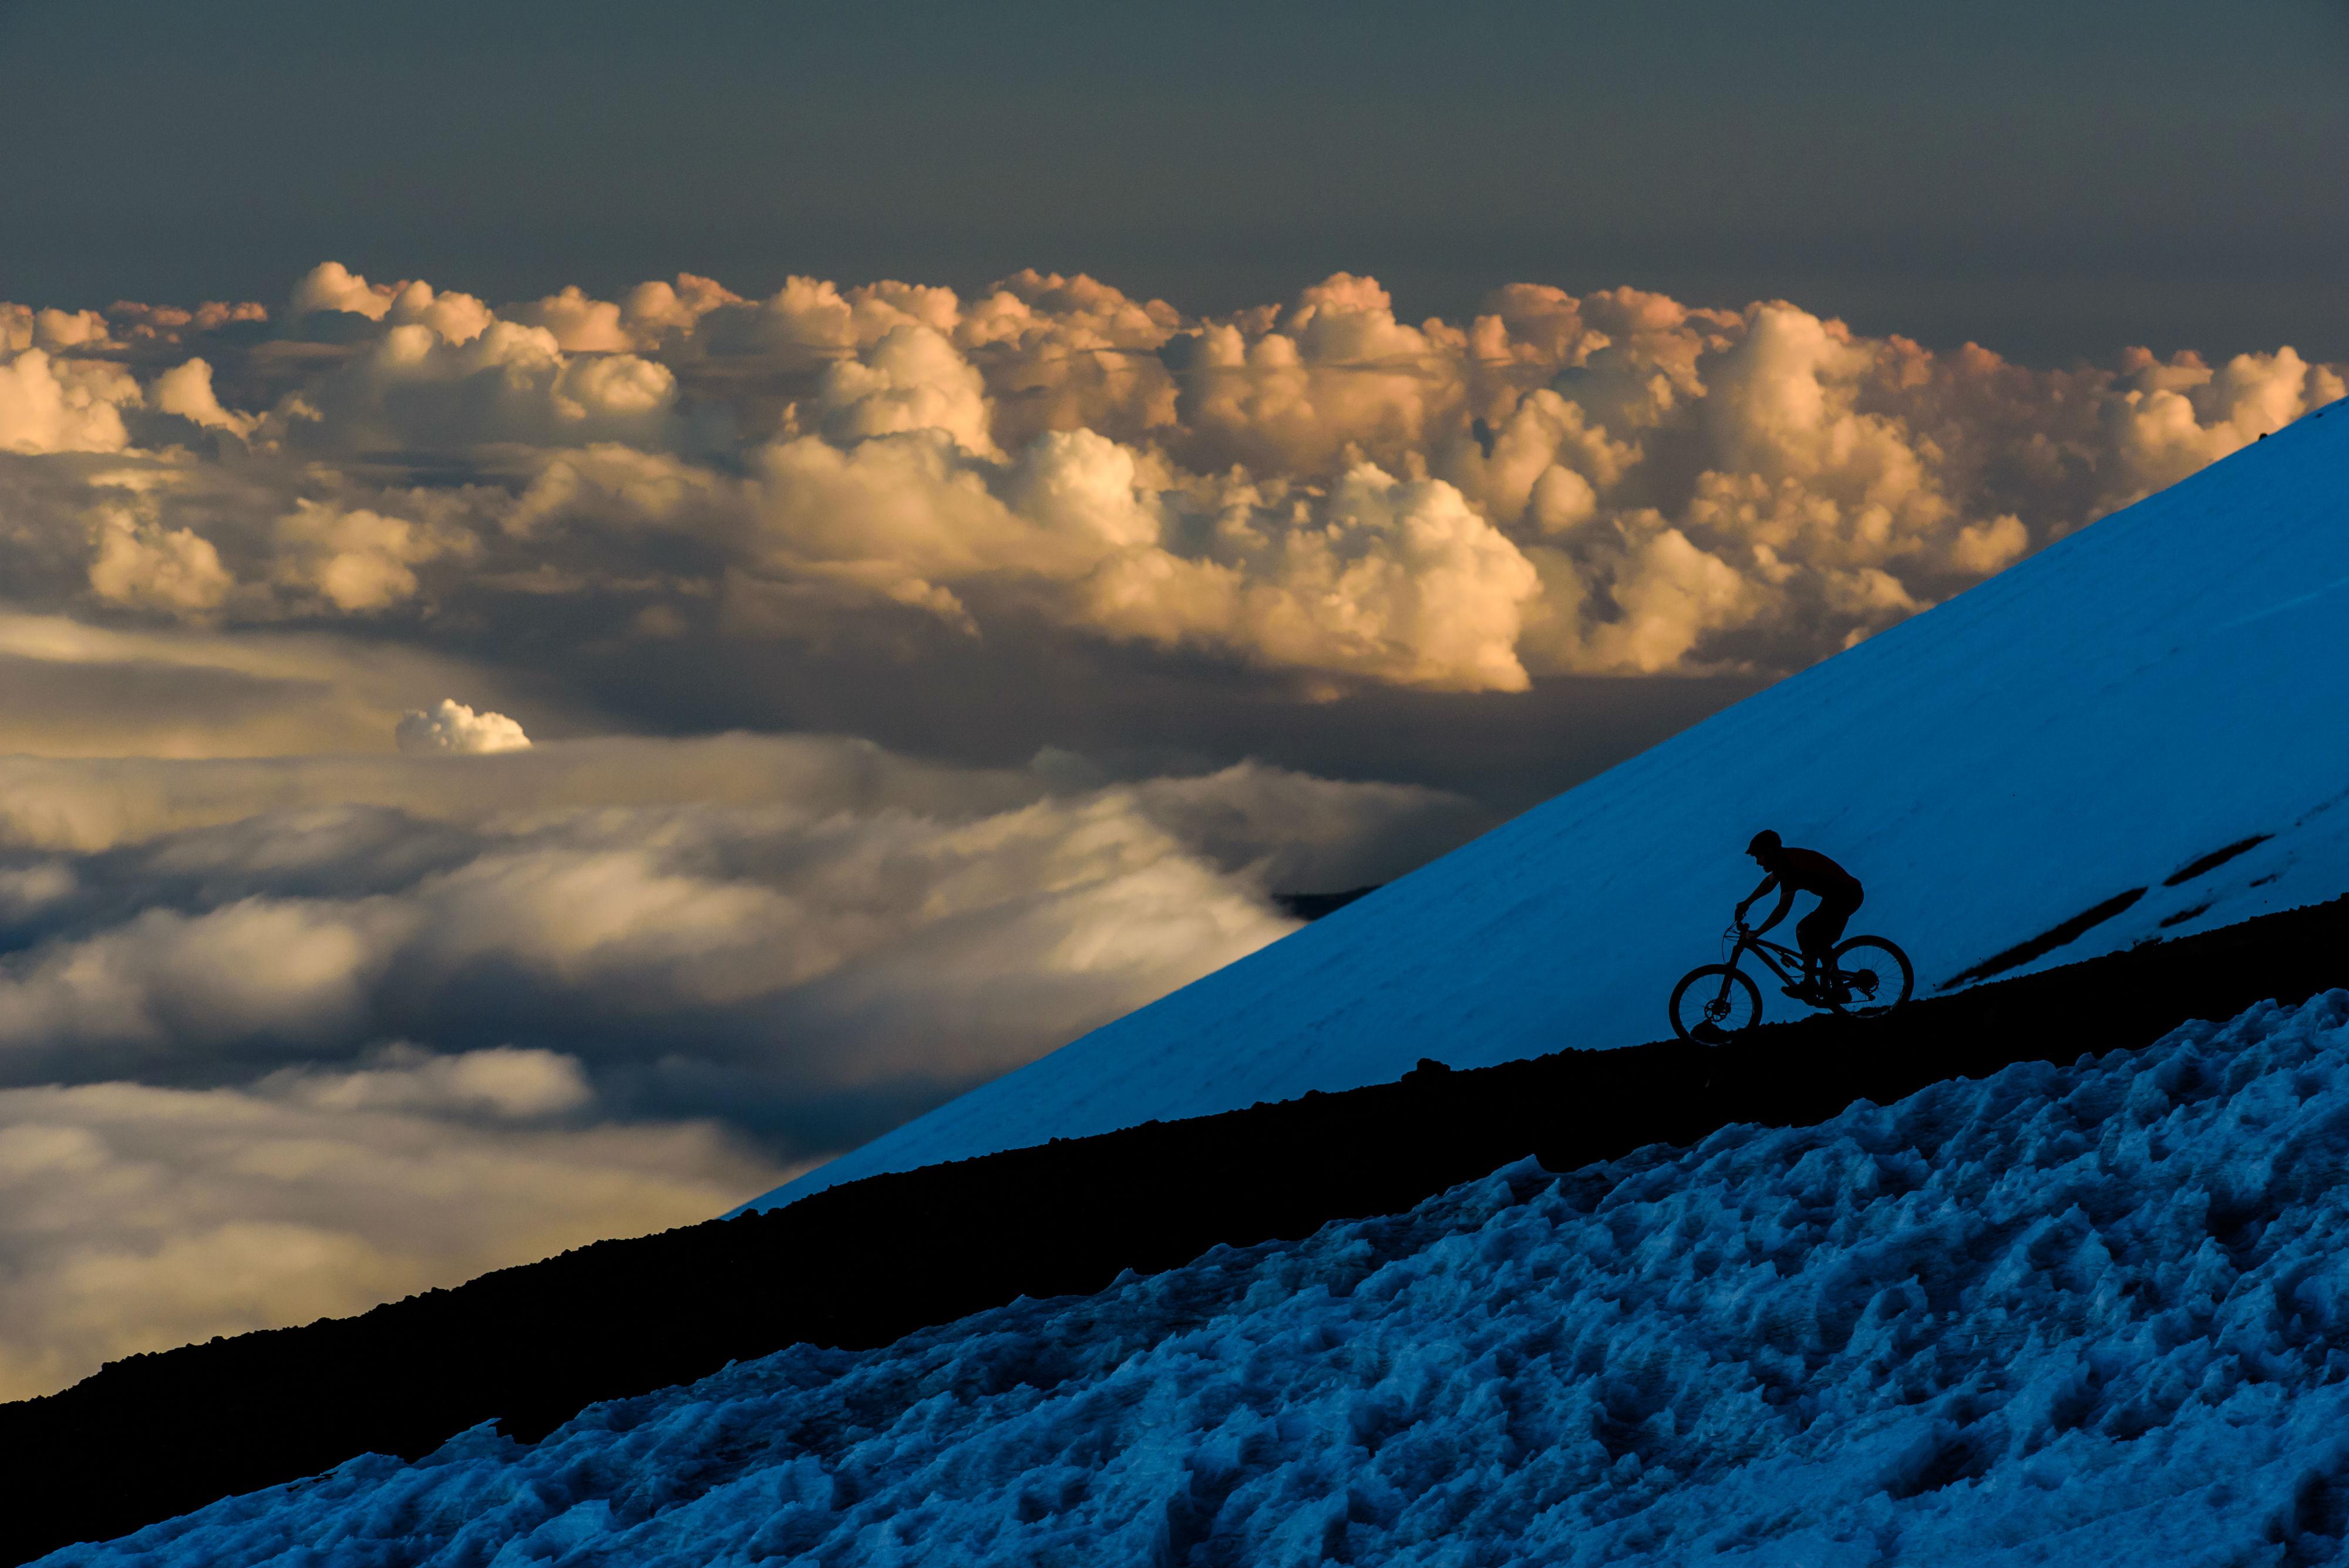 it's called mountain biking